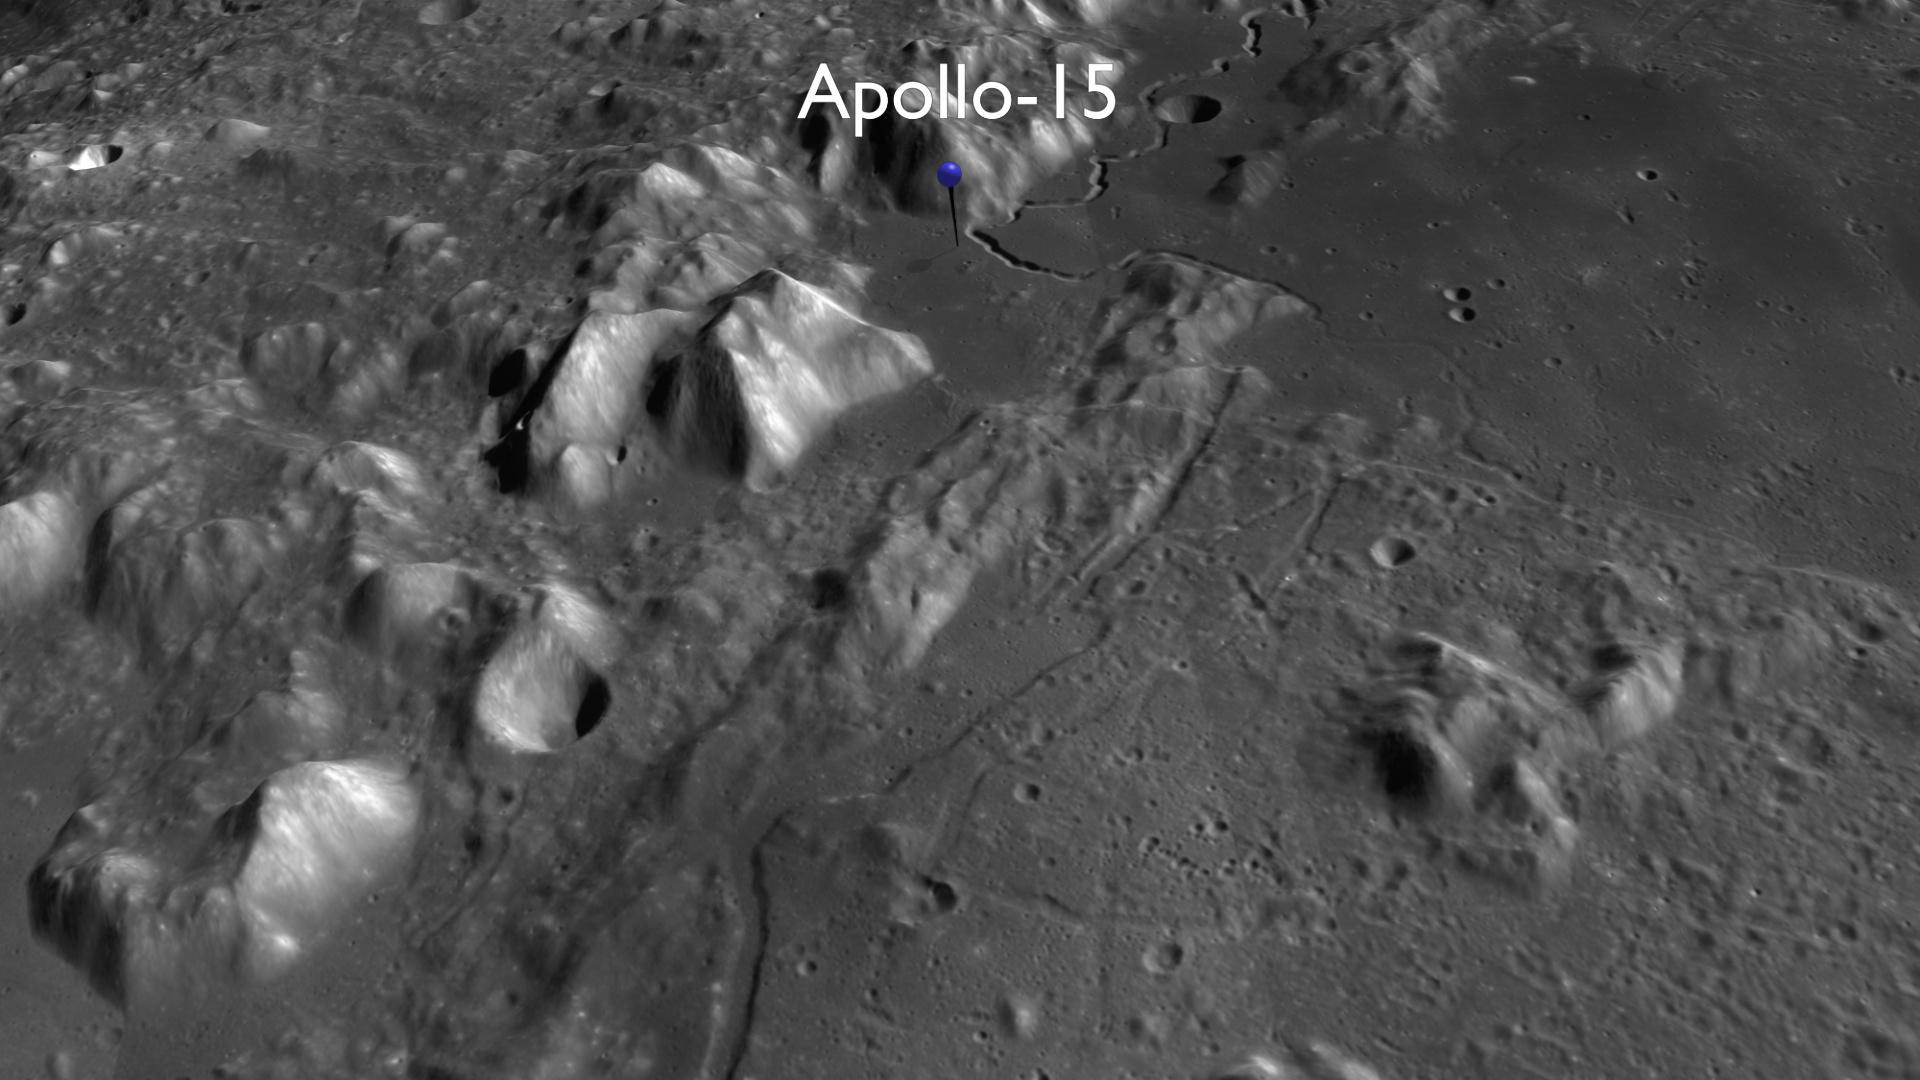 apollo lunar landing sites - photo #23